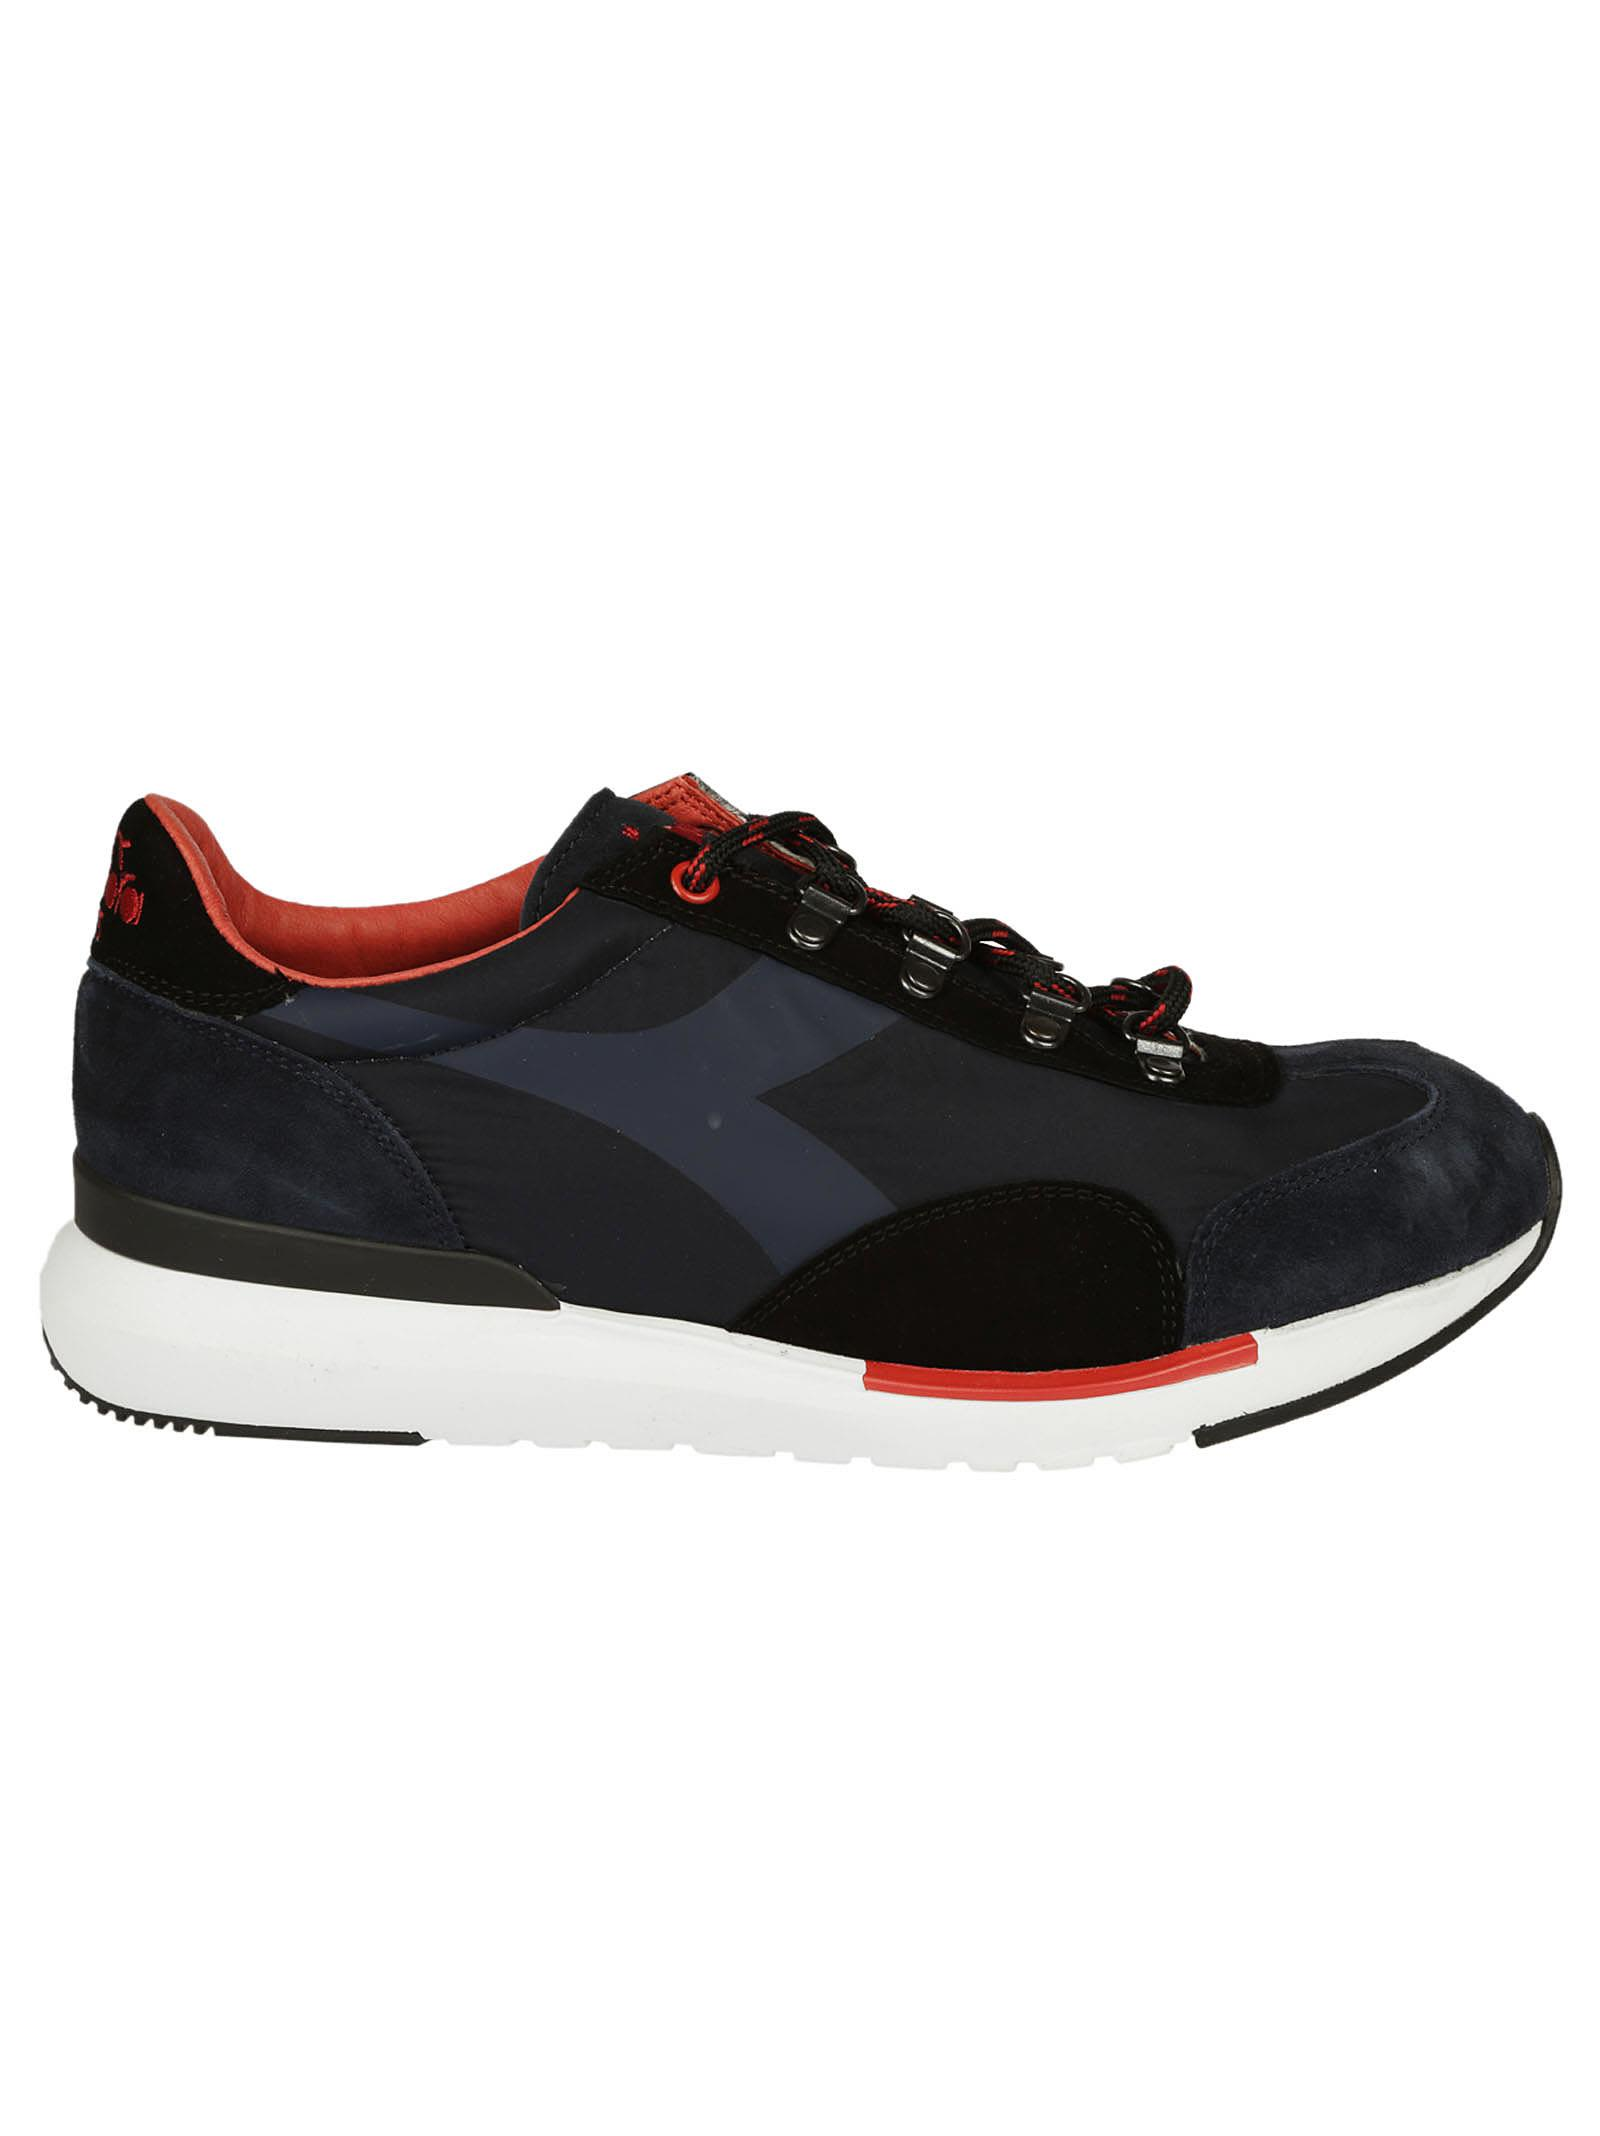 Diadora Equipe Evo Sneakers